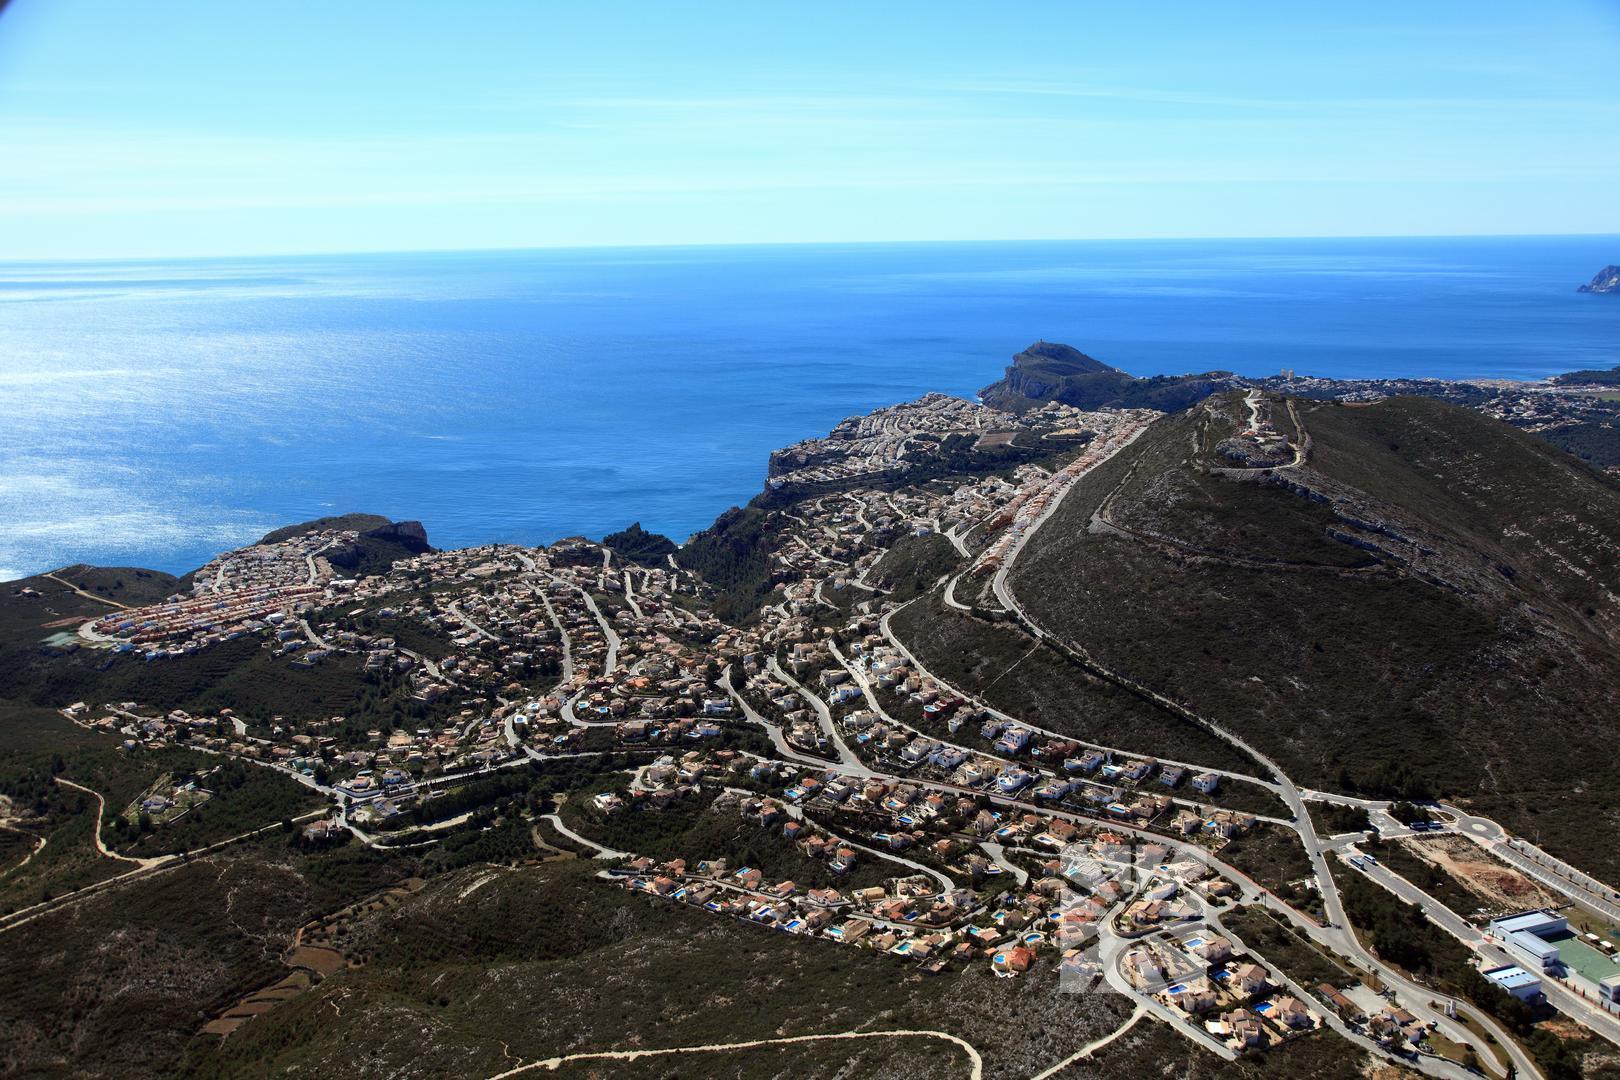 Cumbre del Sol ligt er zonnig bij (Foto: Panoramio)